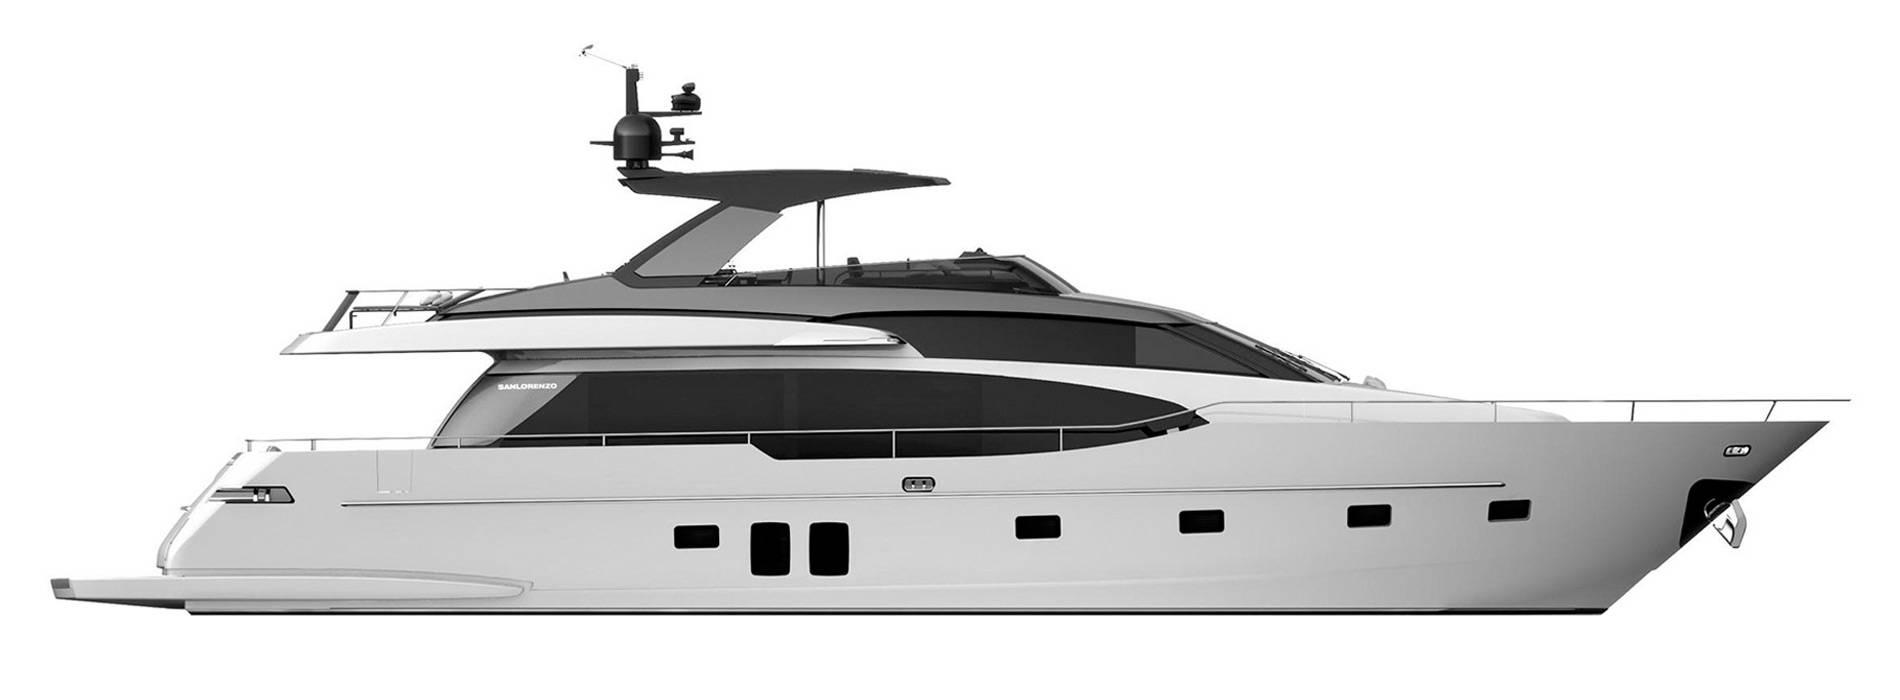 Sanlorenzo Yachts SL78 Profile